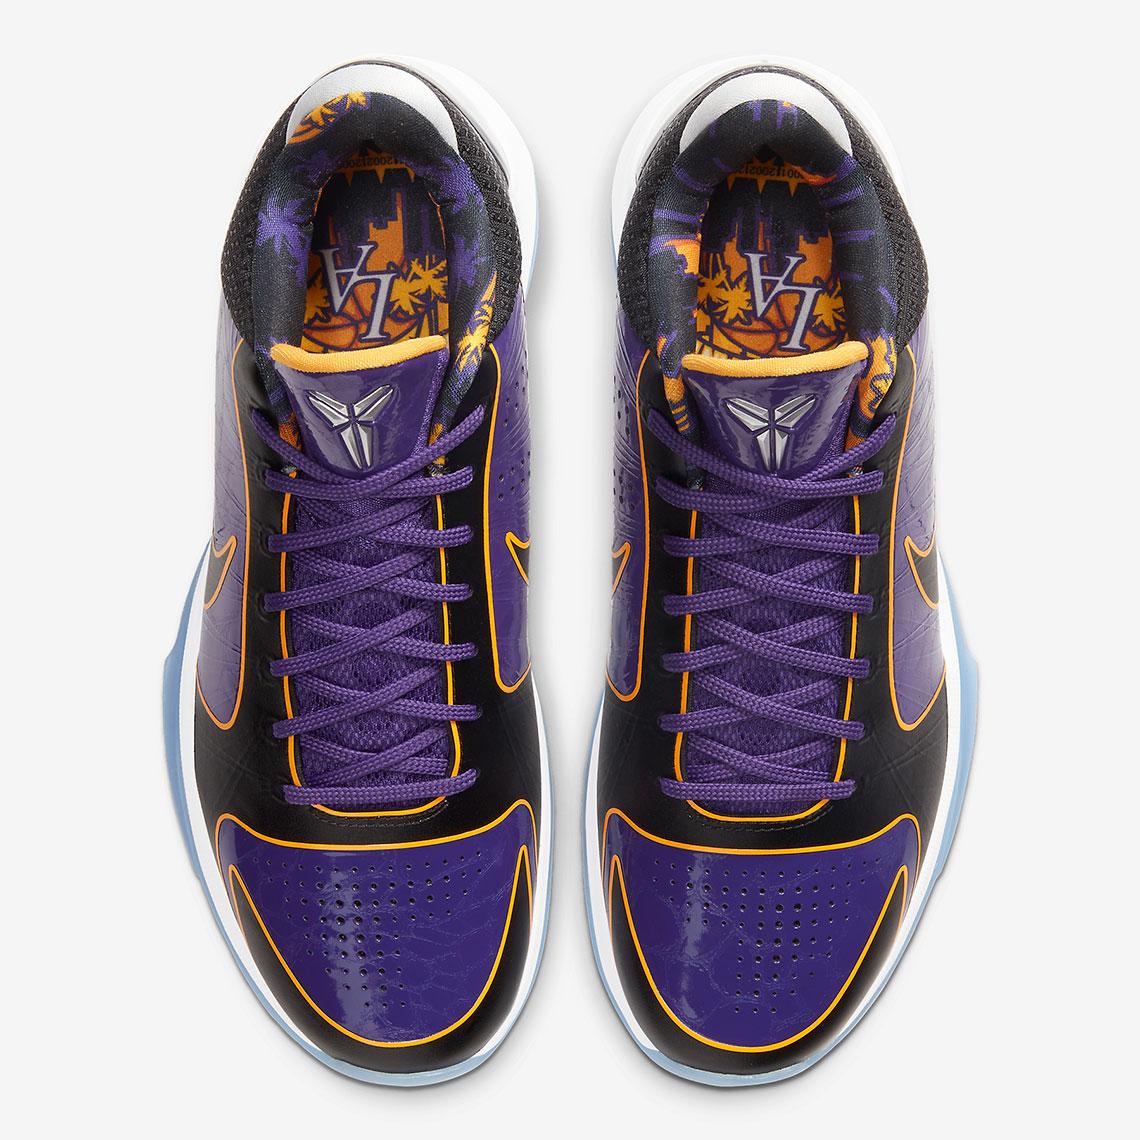 5_Nike Zoom Kobe 5 Proto Lakers